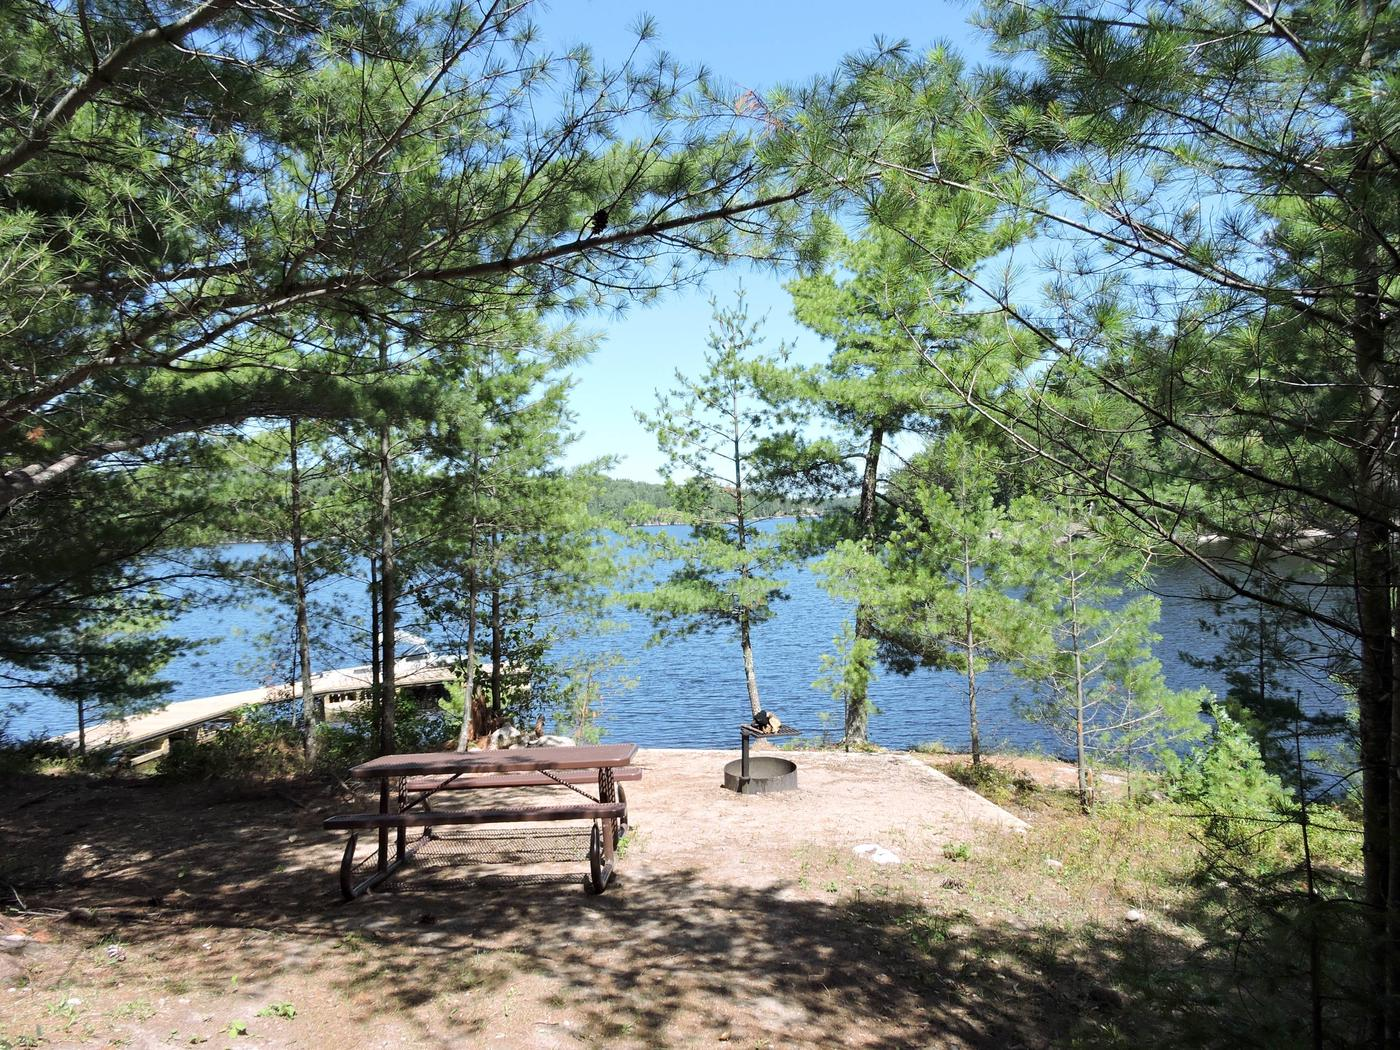 S27 - Jensen BayS27 - Jensen Bay campsite on Sandpoint Lake